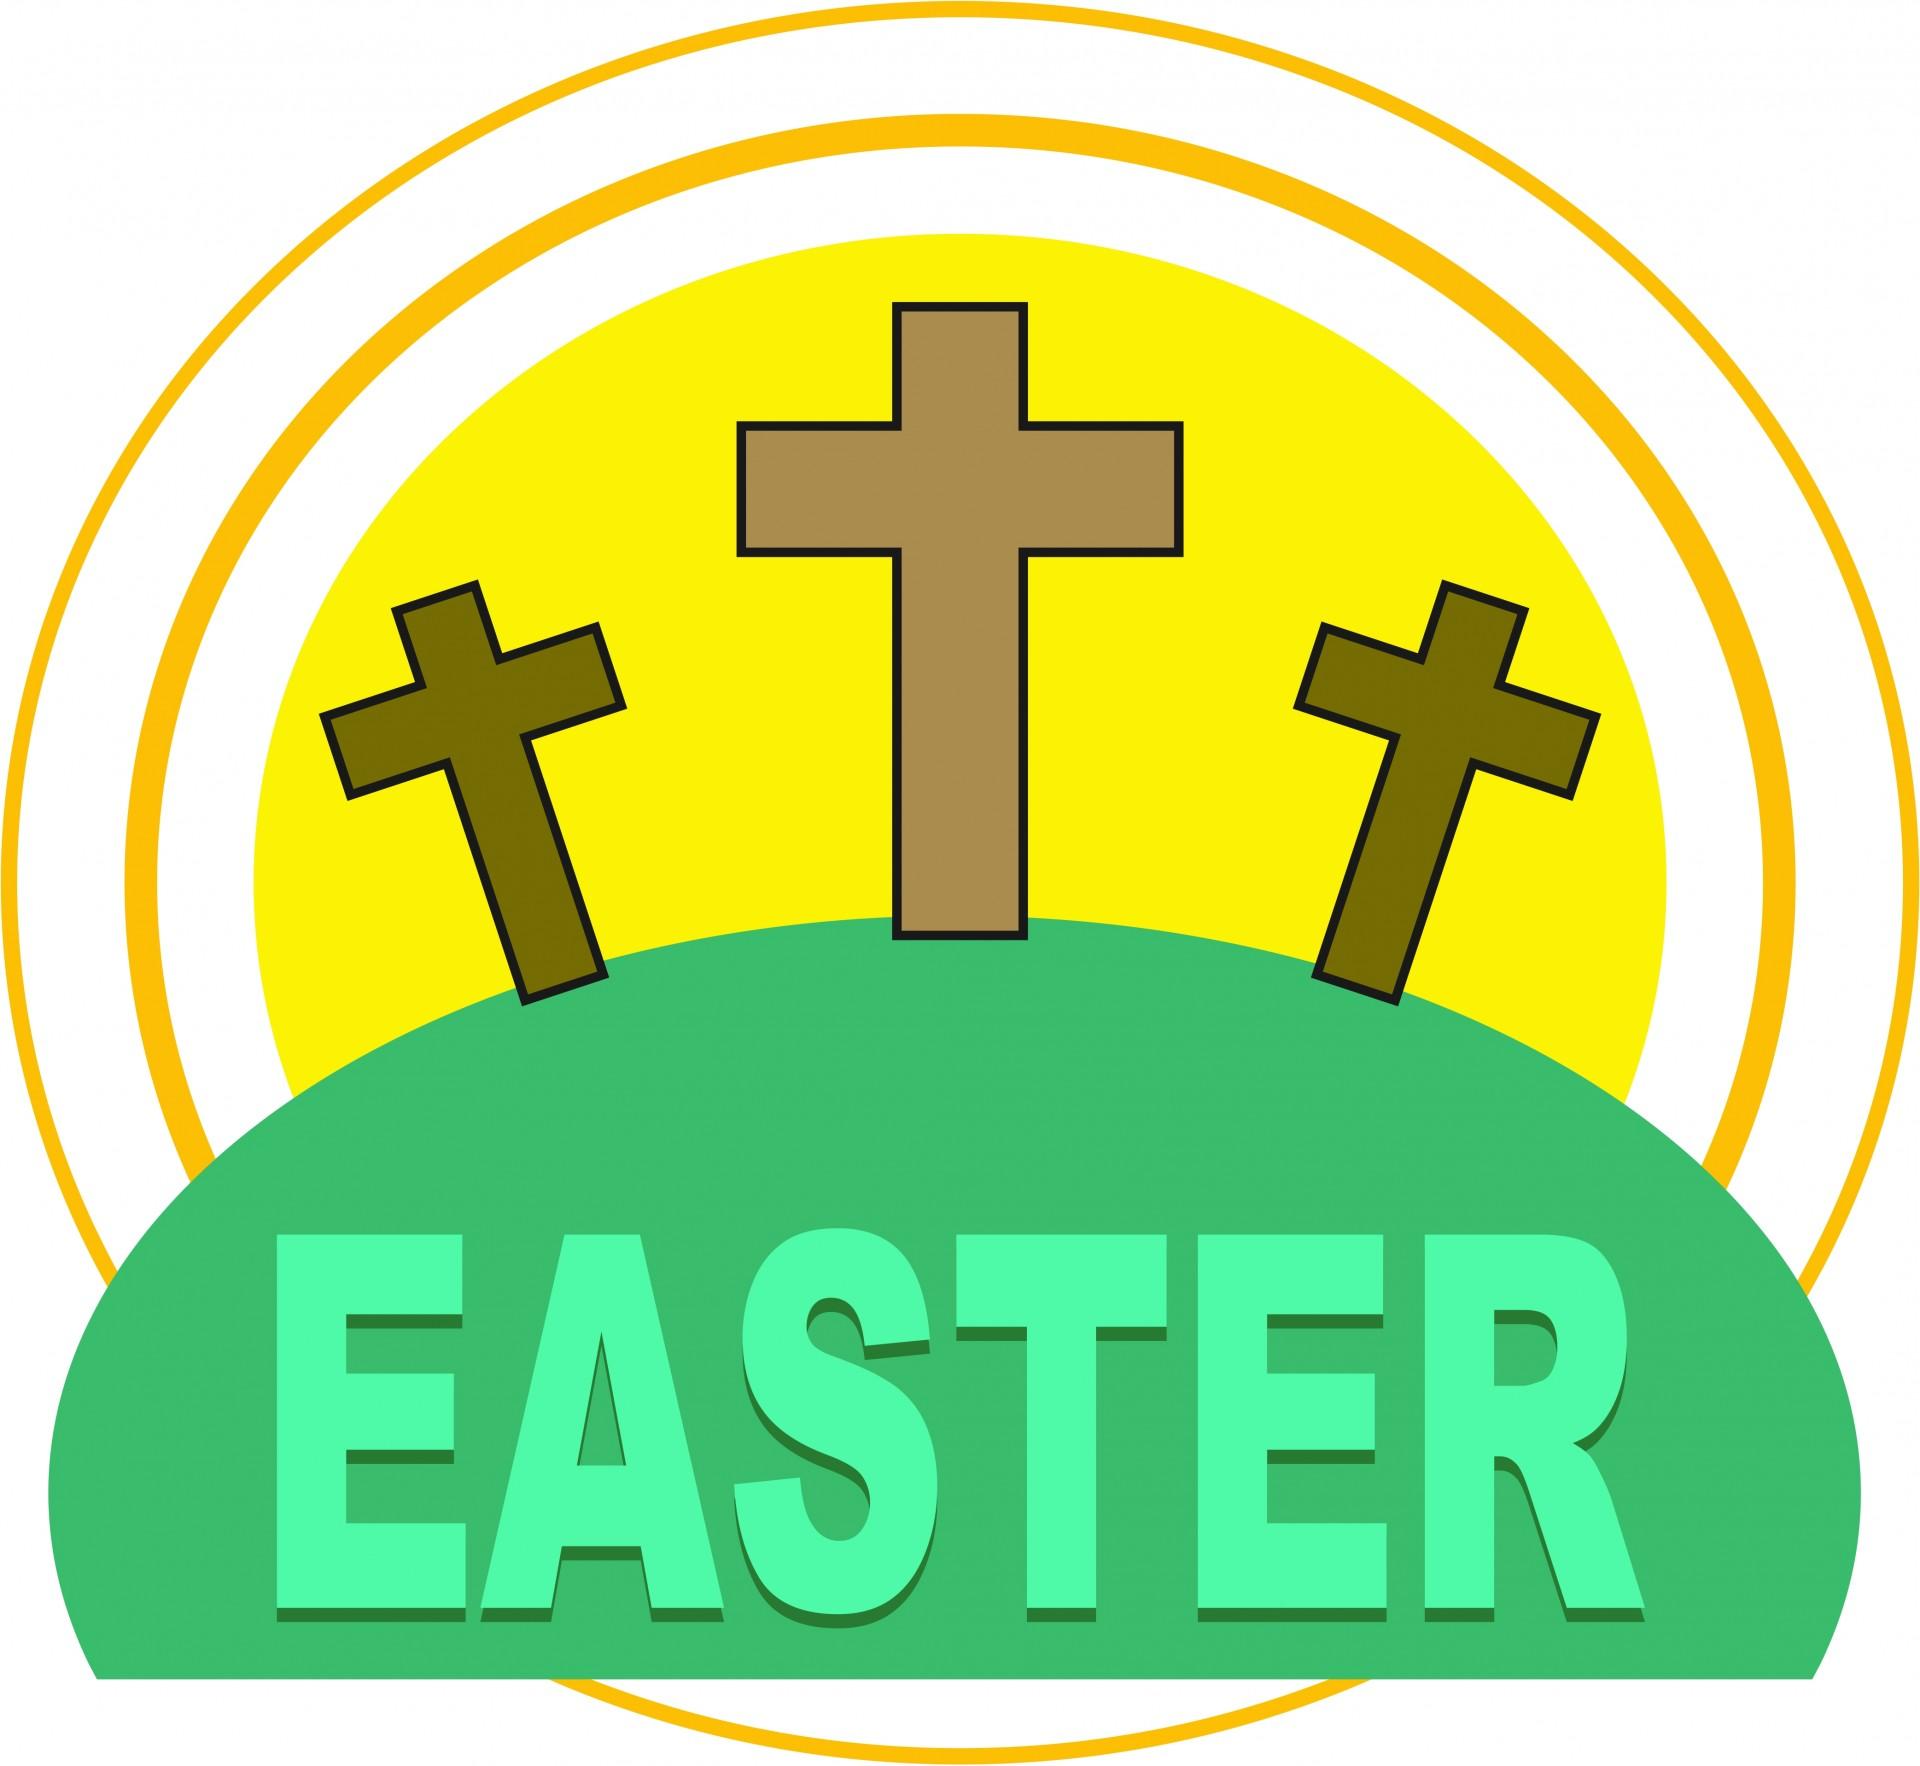 Easter Clipart Christian & Easter Christian Clip Art Images.